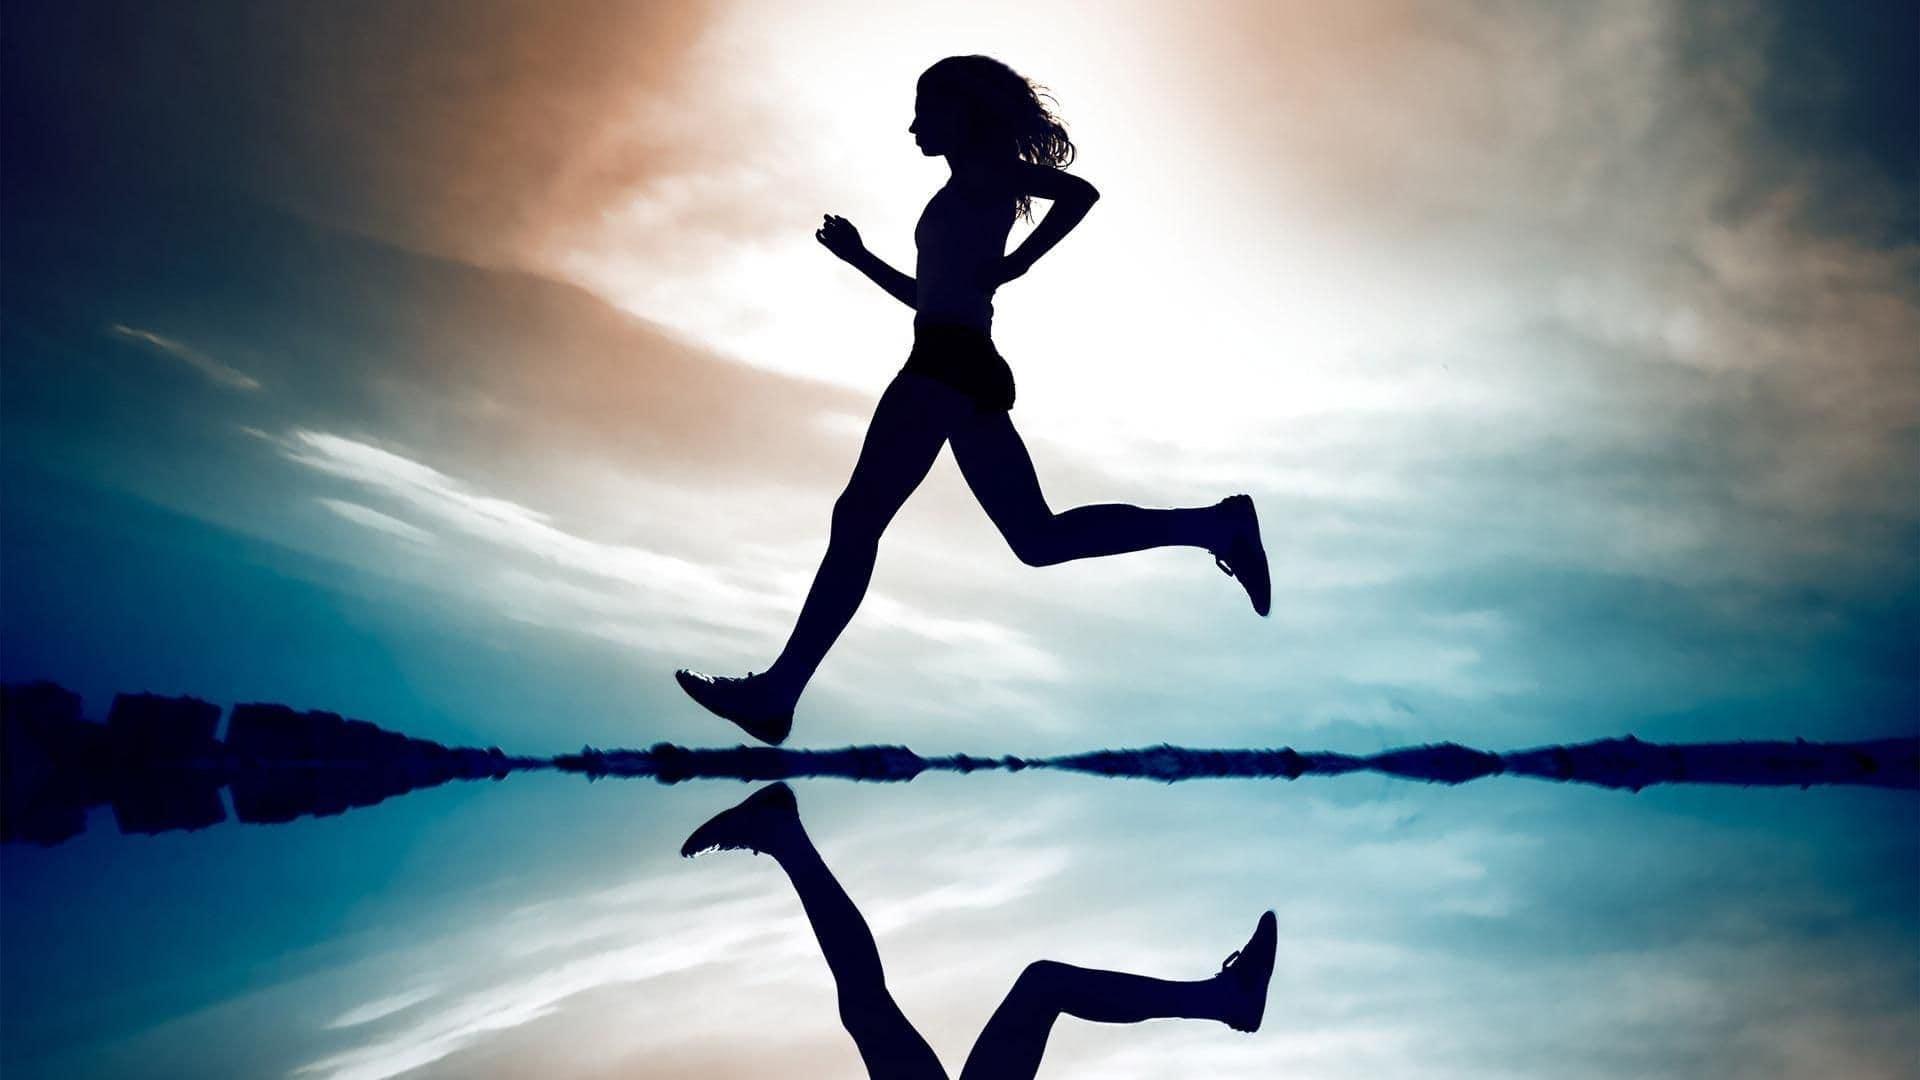 running dream meaning, dream about running, running dream interpretation, seeing in a dream running